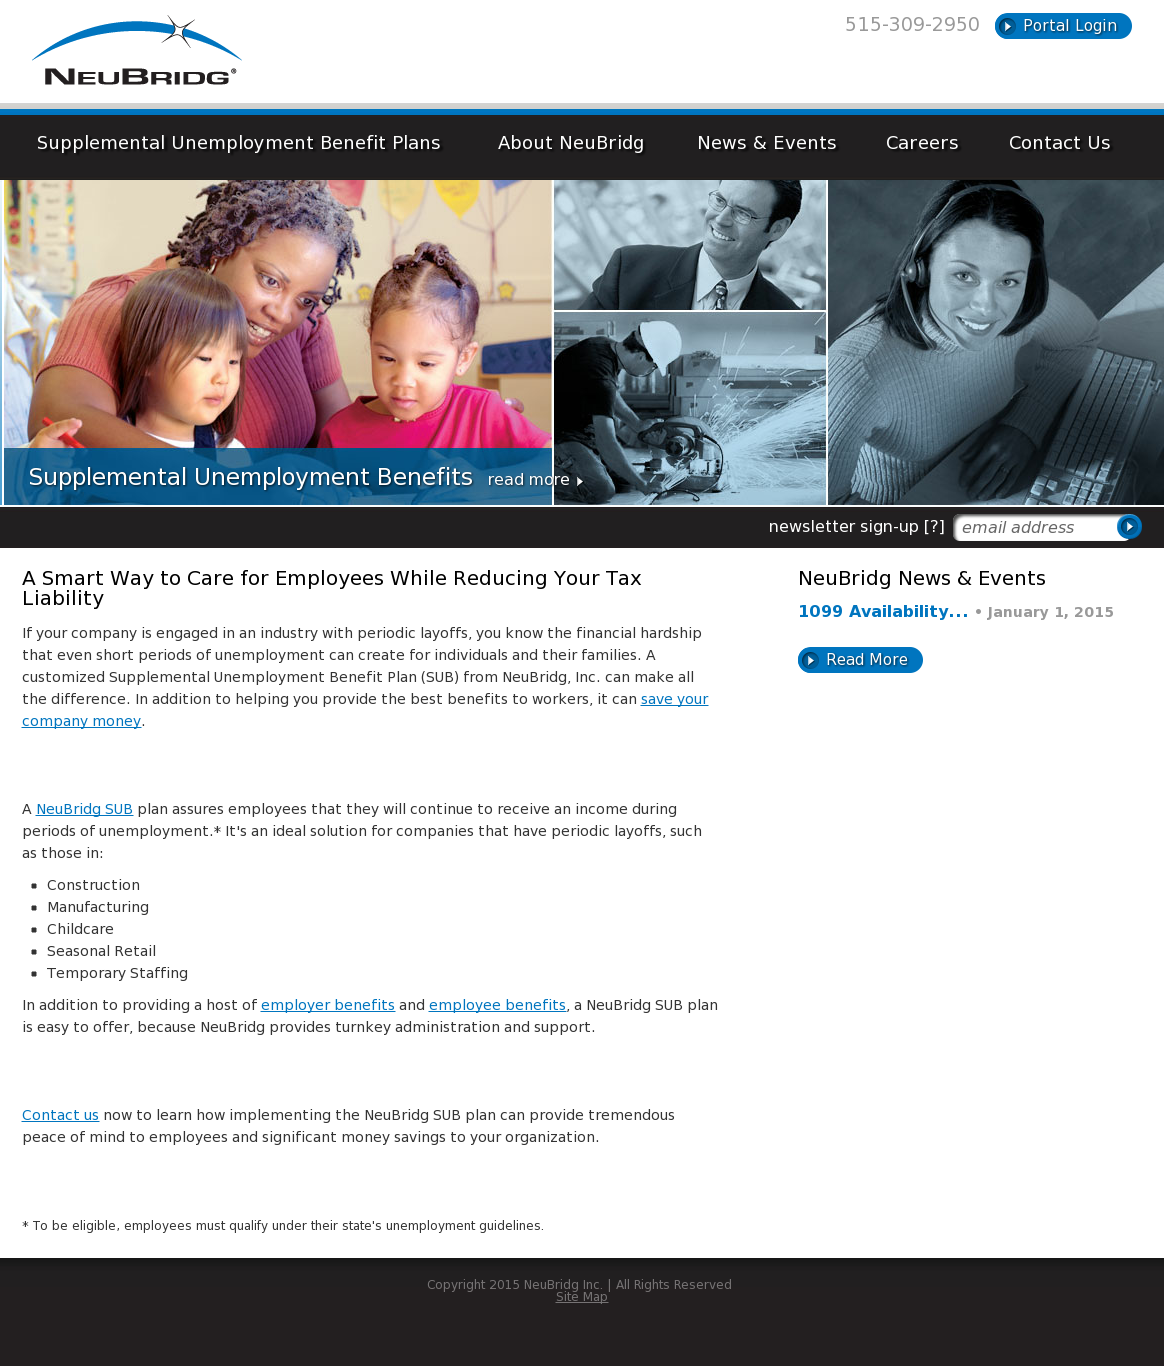 Neubridg Competitors, Revenue and Employees - Owler Company Profile